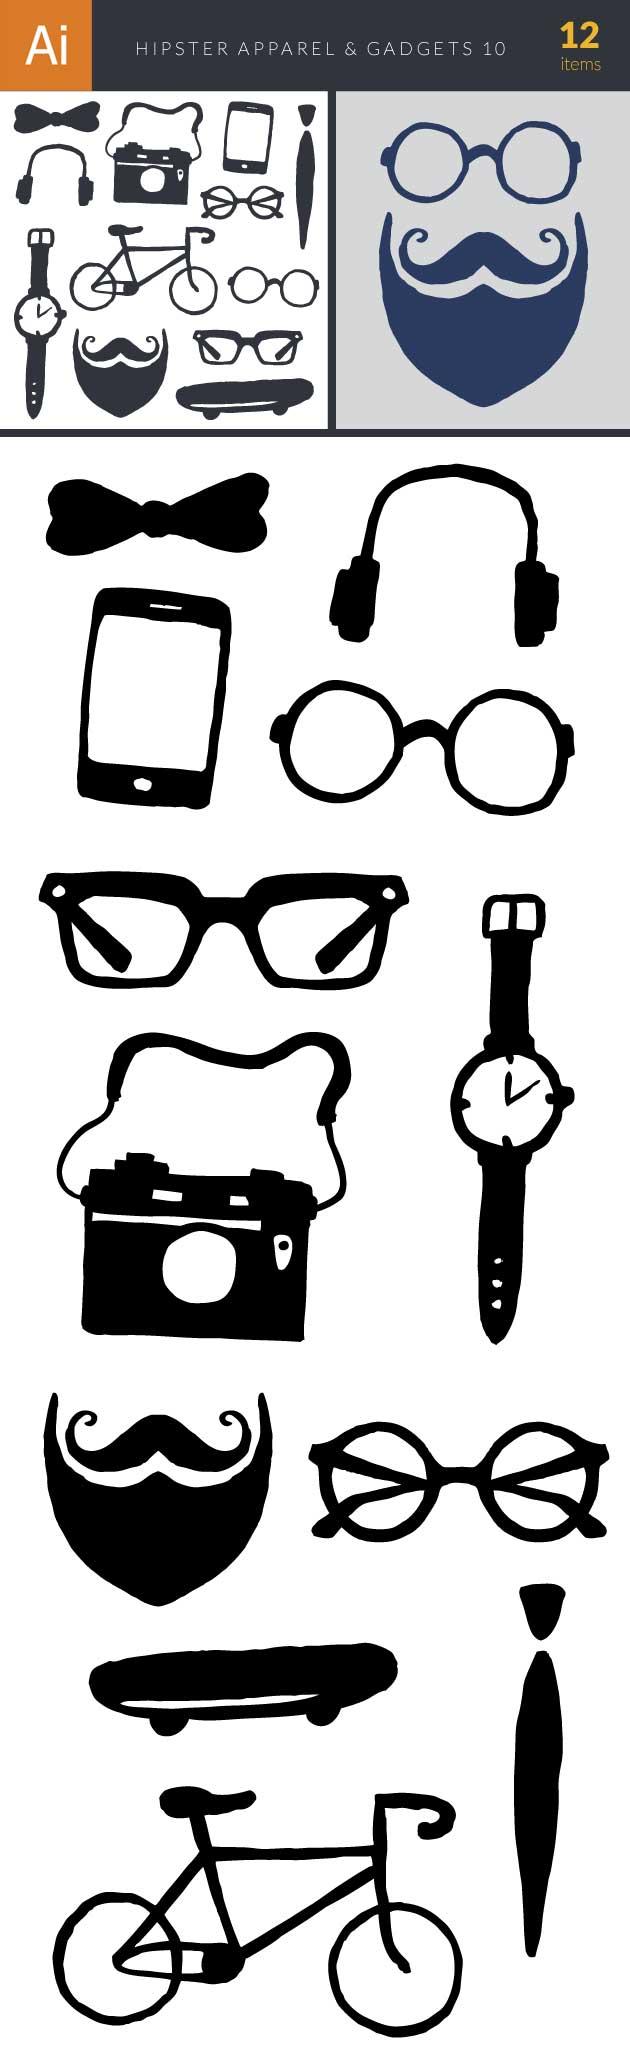 design-tnt-hipster-apparel-&-gadgets-set-10-large-preview